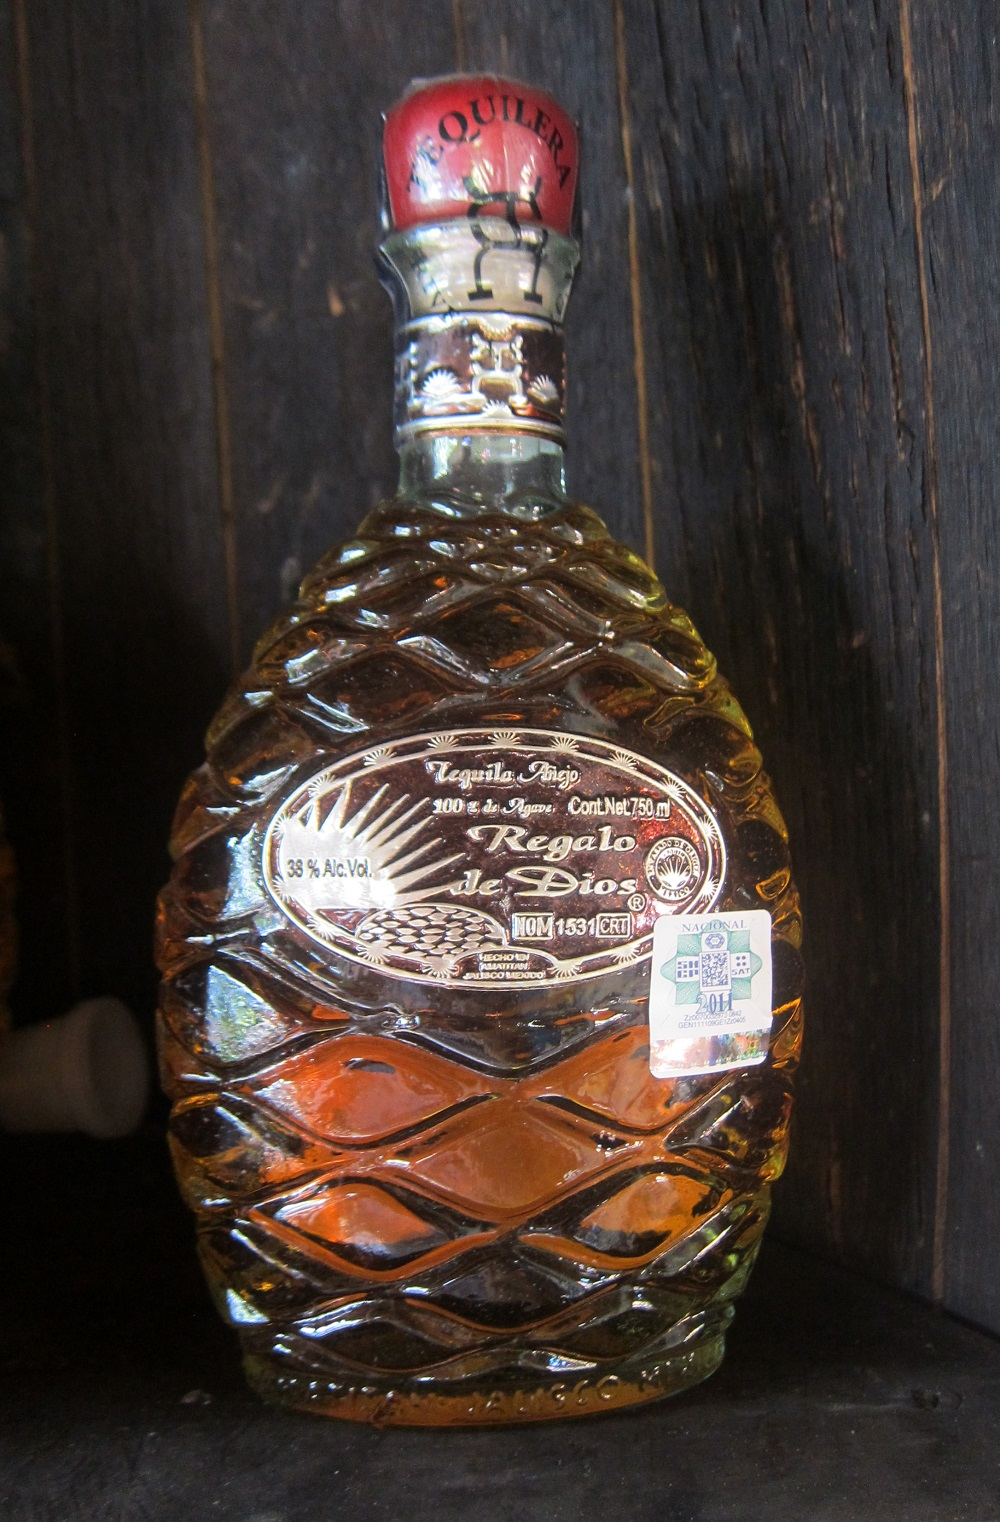 Isola_di_cozume_tequila